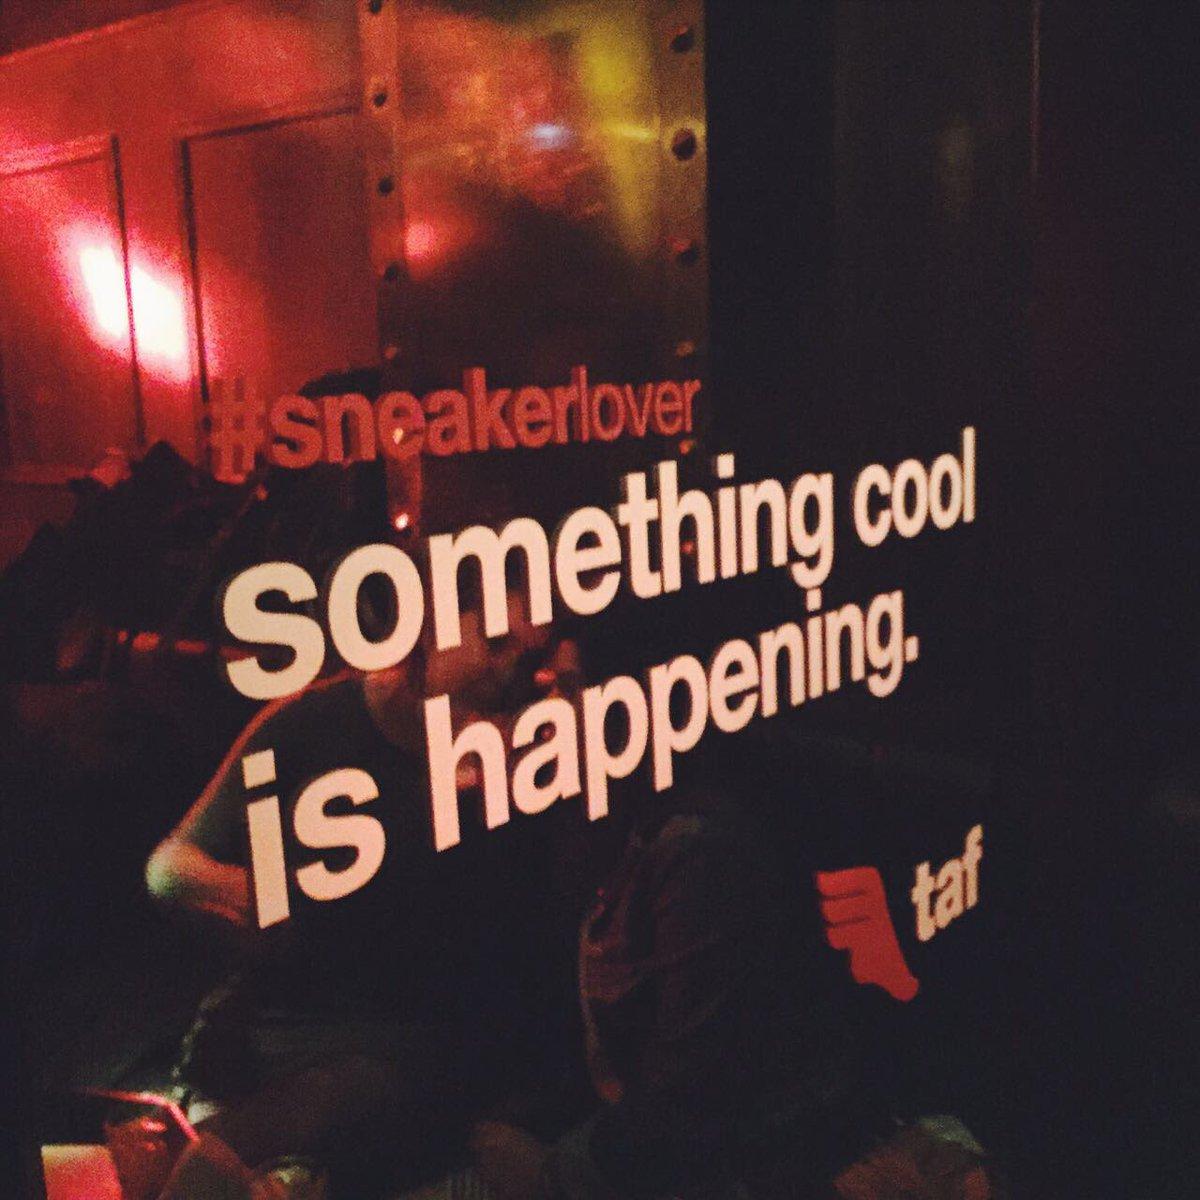 My @TAFmx Story #SNEAKERLOVER #ModaNacional #Cobertura<br>http://pic.twitter.com/sBRuKVJ9eW